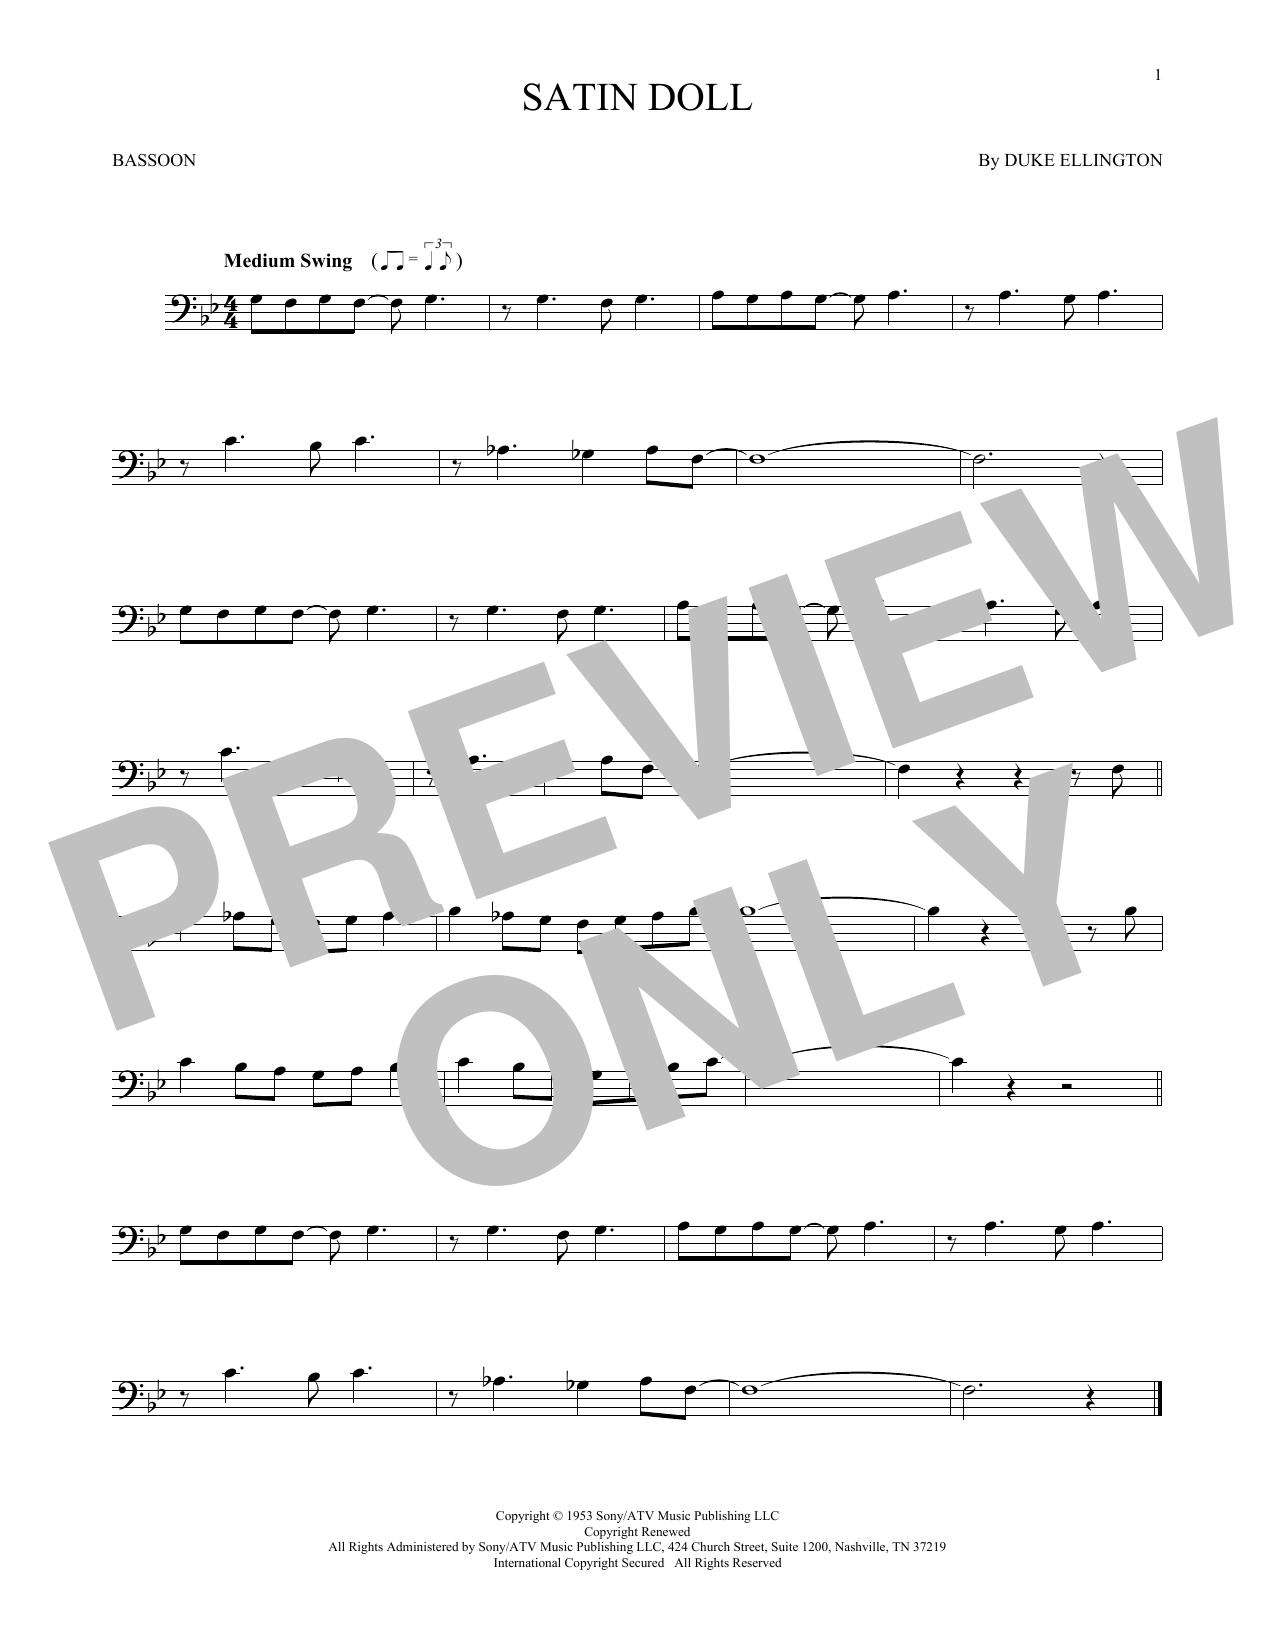 Satin Doll (Bassoon Solo)